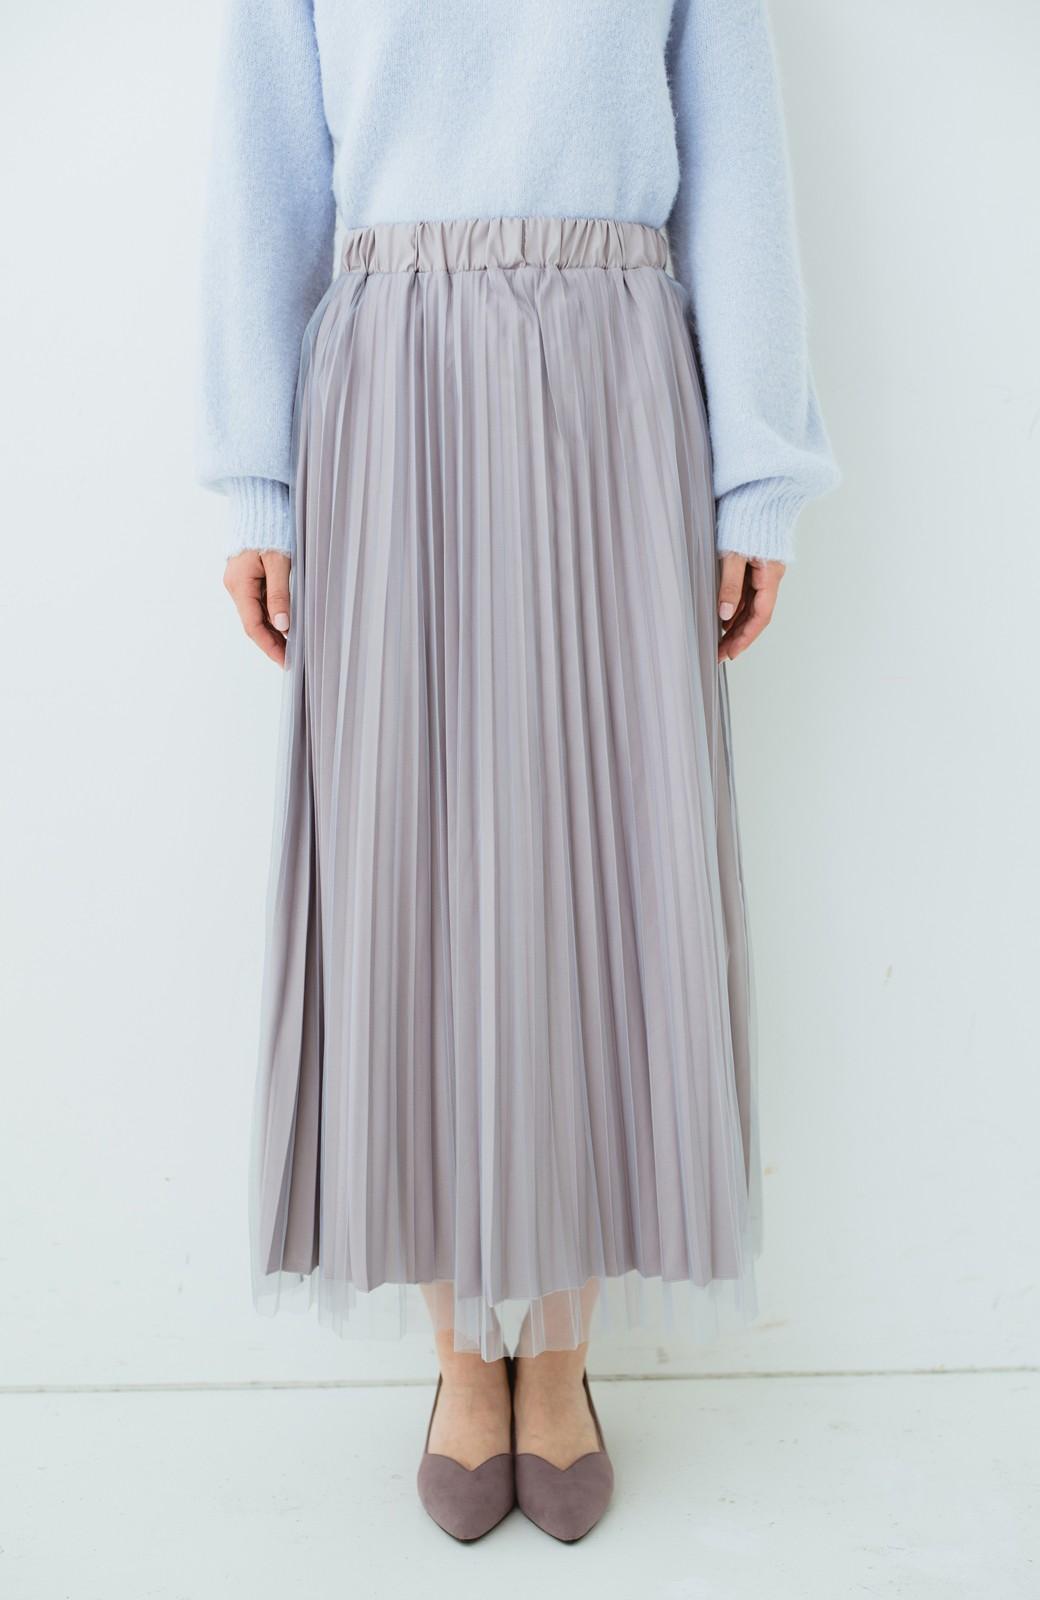 haco! どんな日も華やか気分にしてくれる 二枚仕立てのチュールプリーツスカート <ライトグレー>の商品写真4